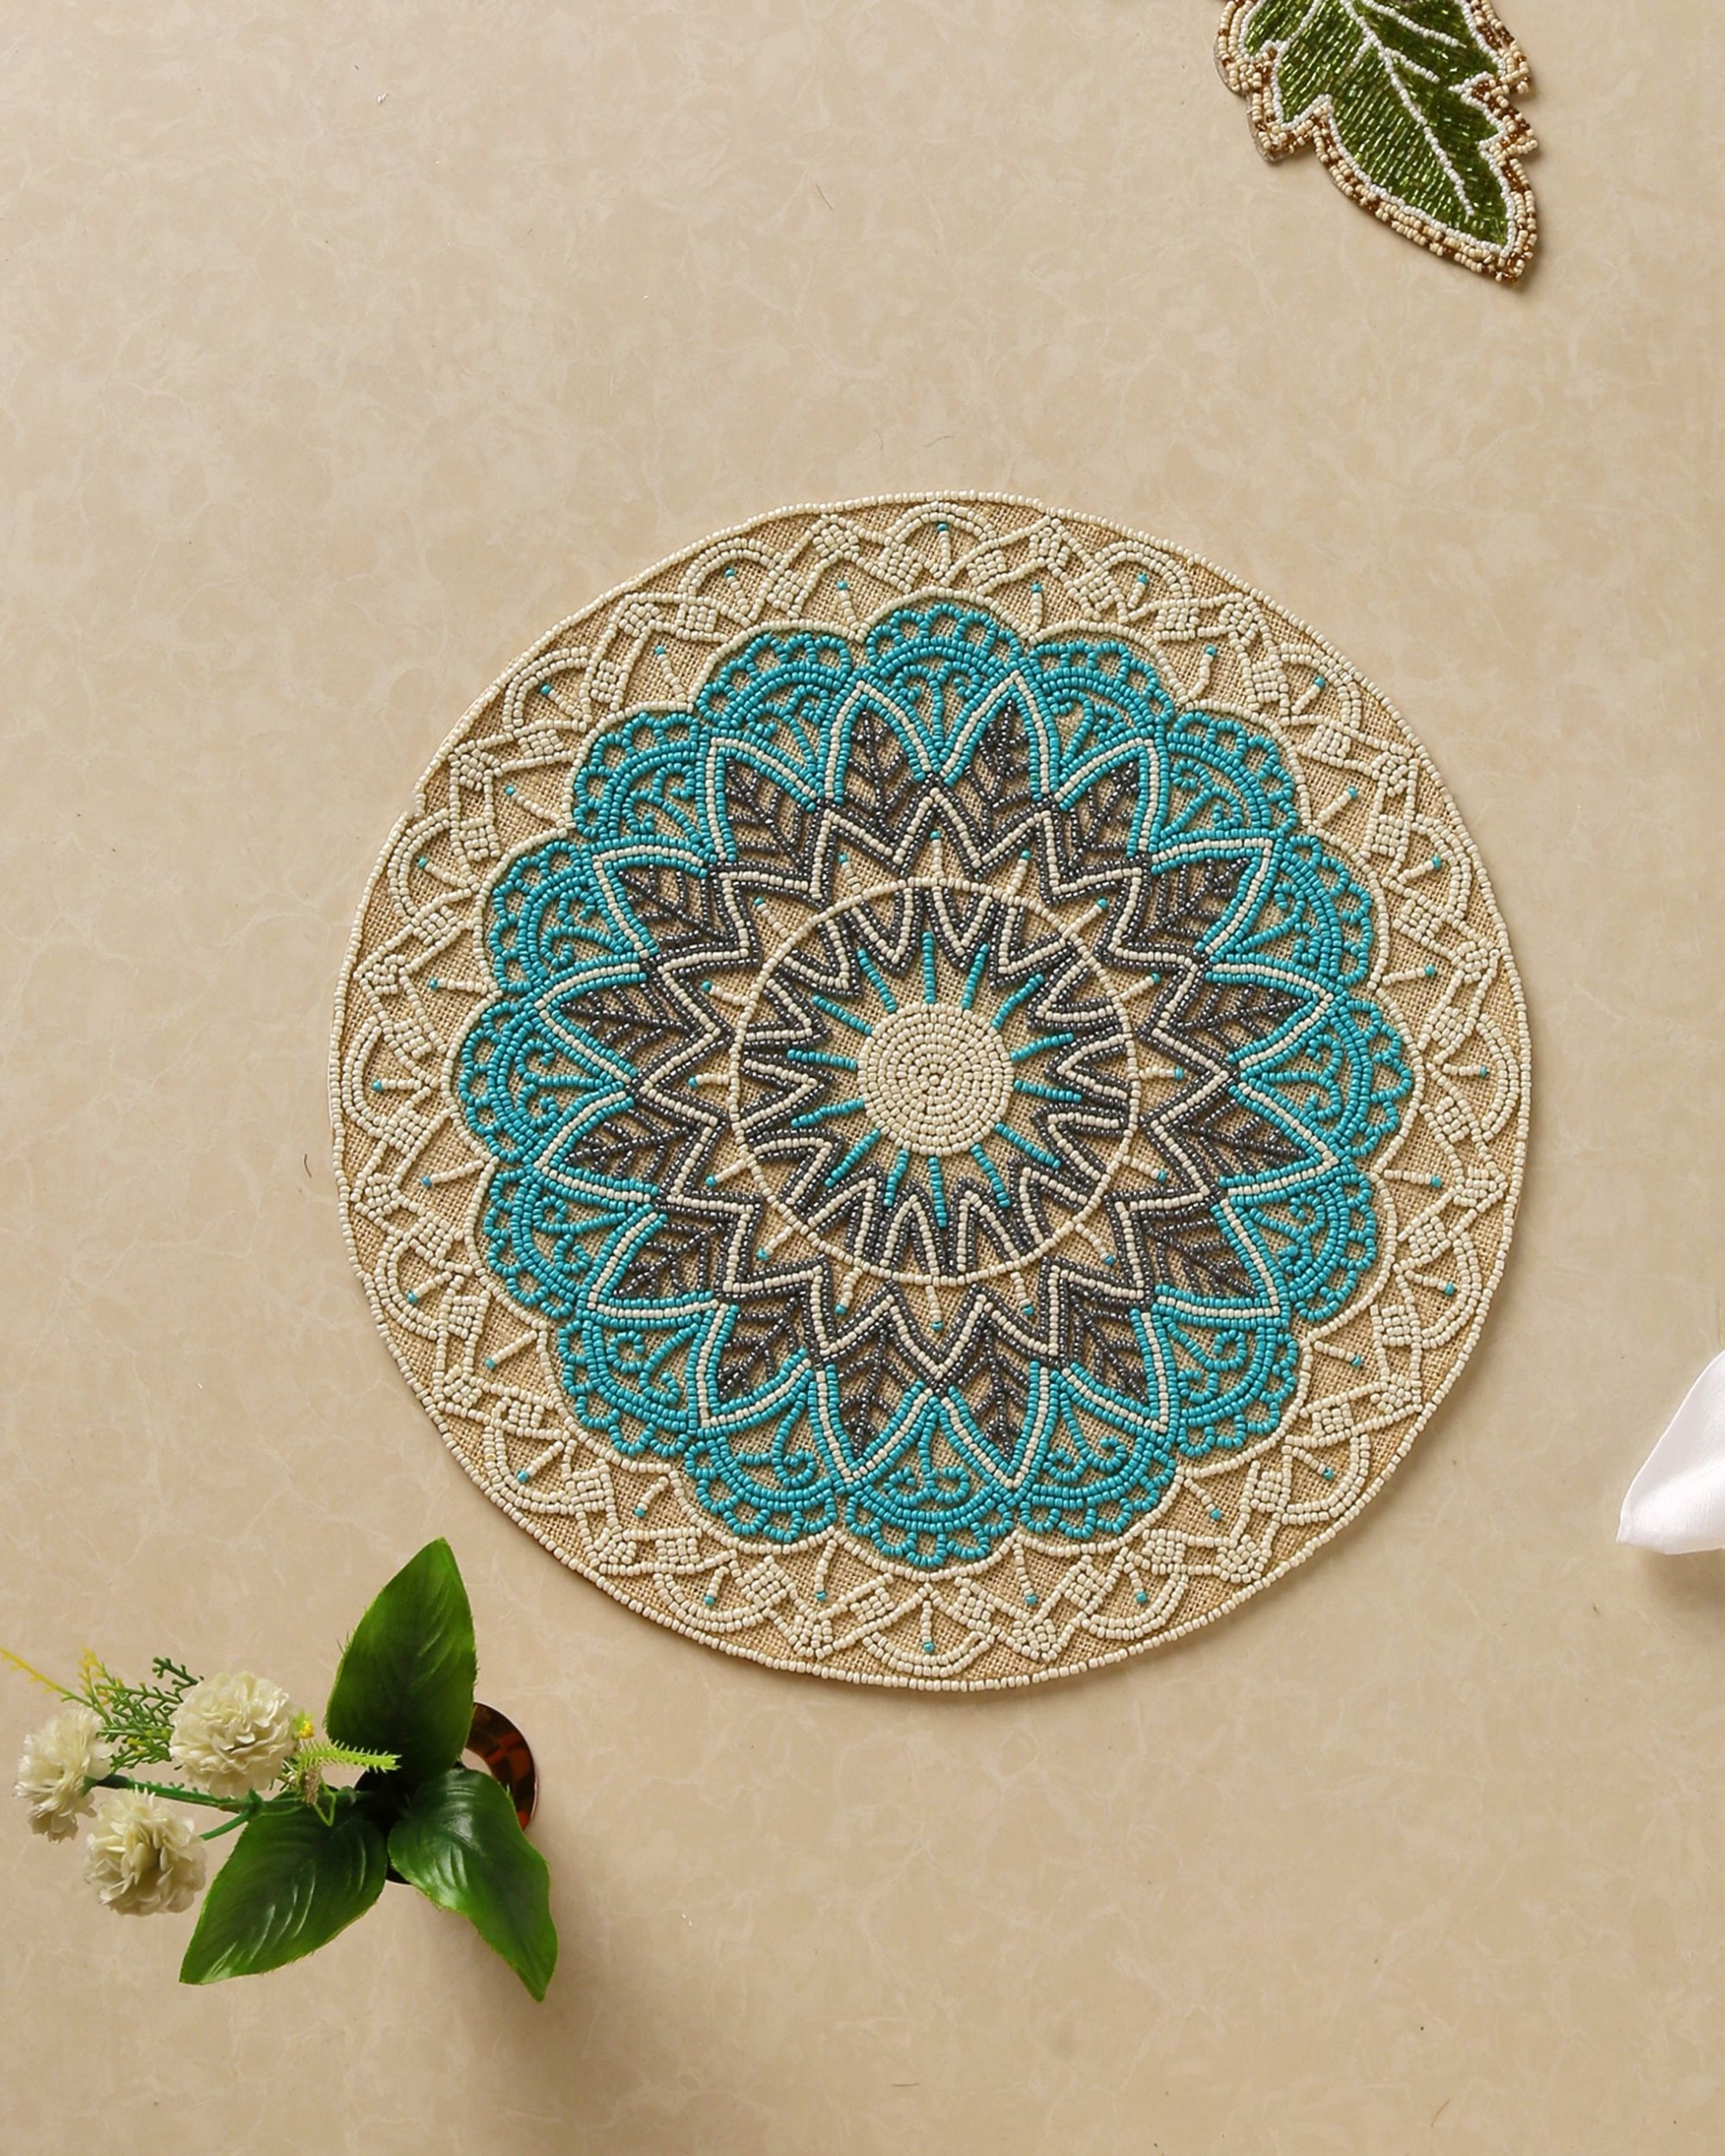 Blue hand beaded jute table mat